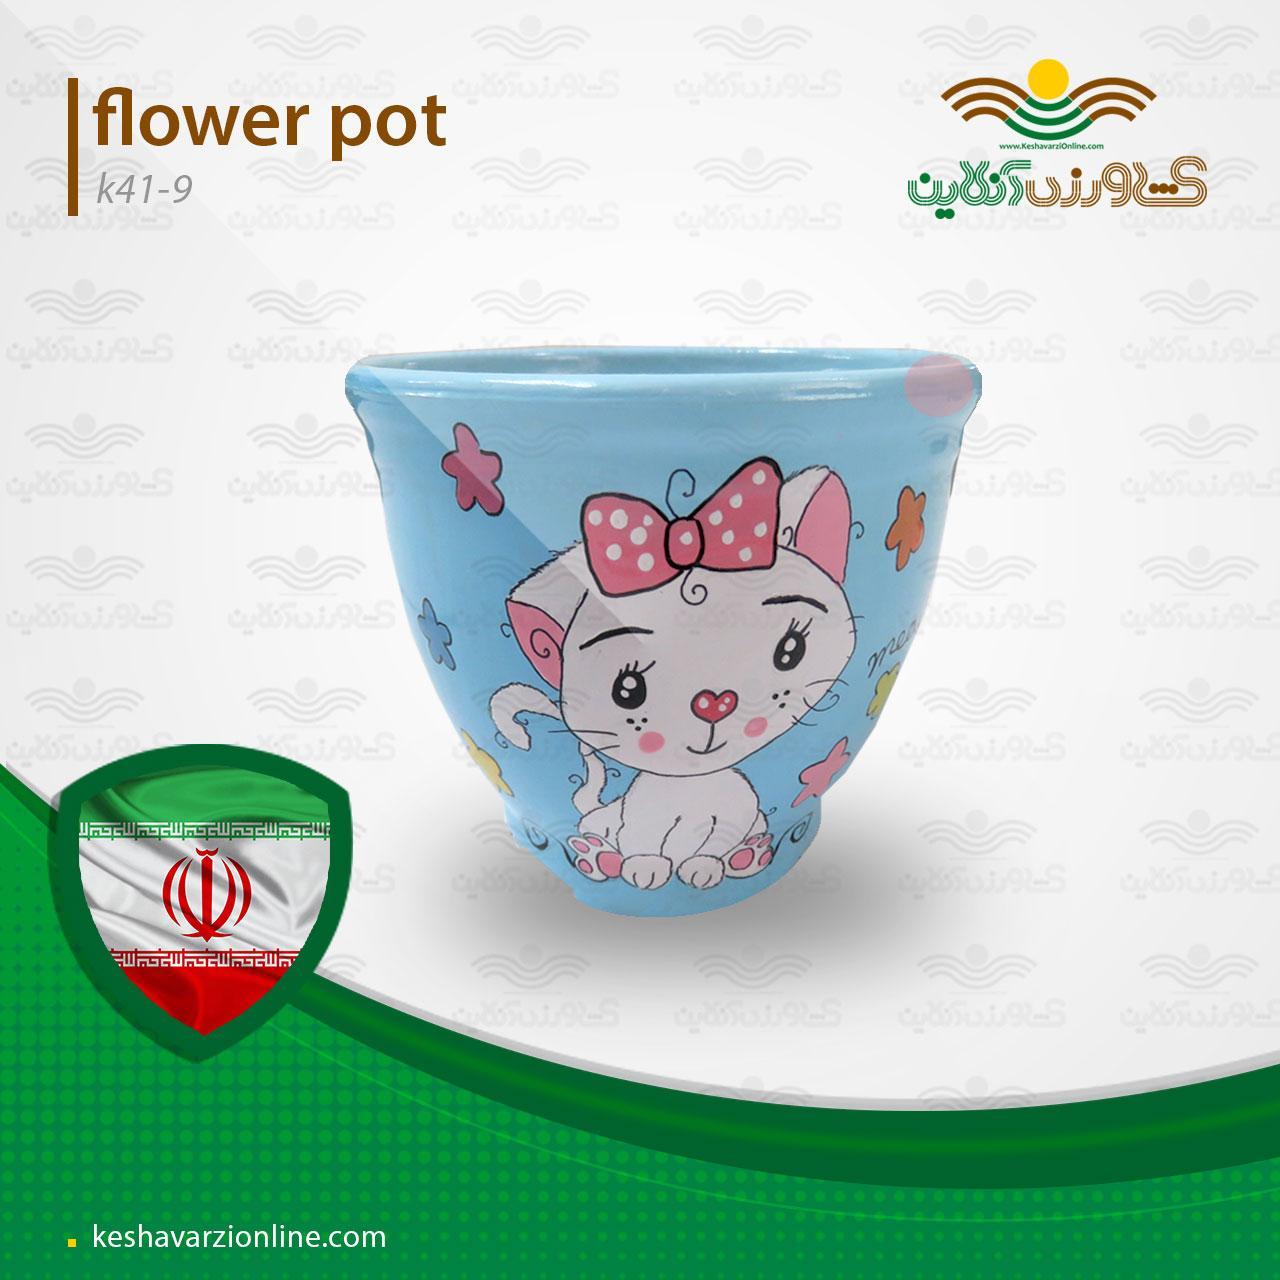 گلدان دکوری K41.9